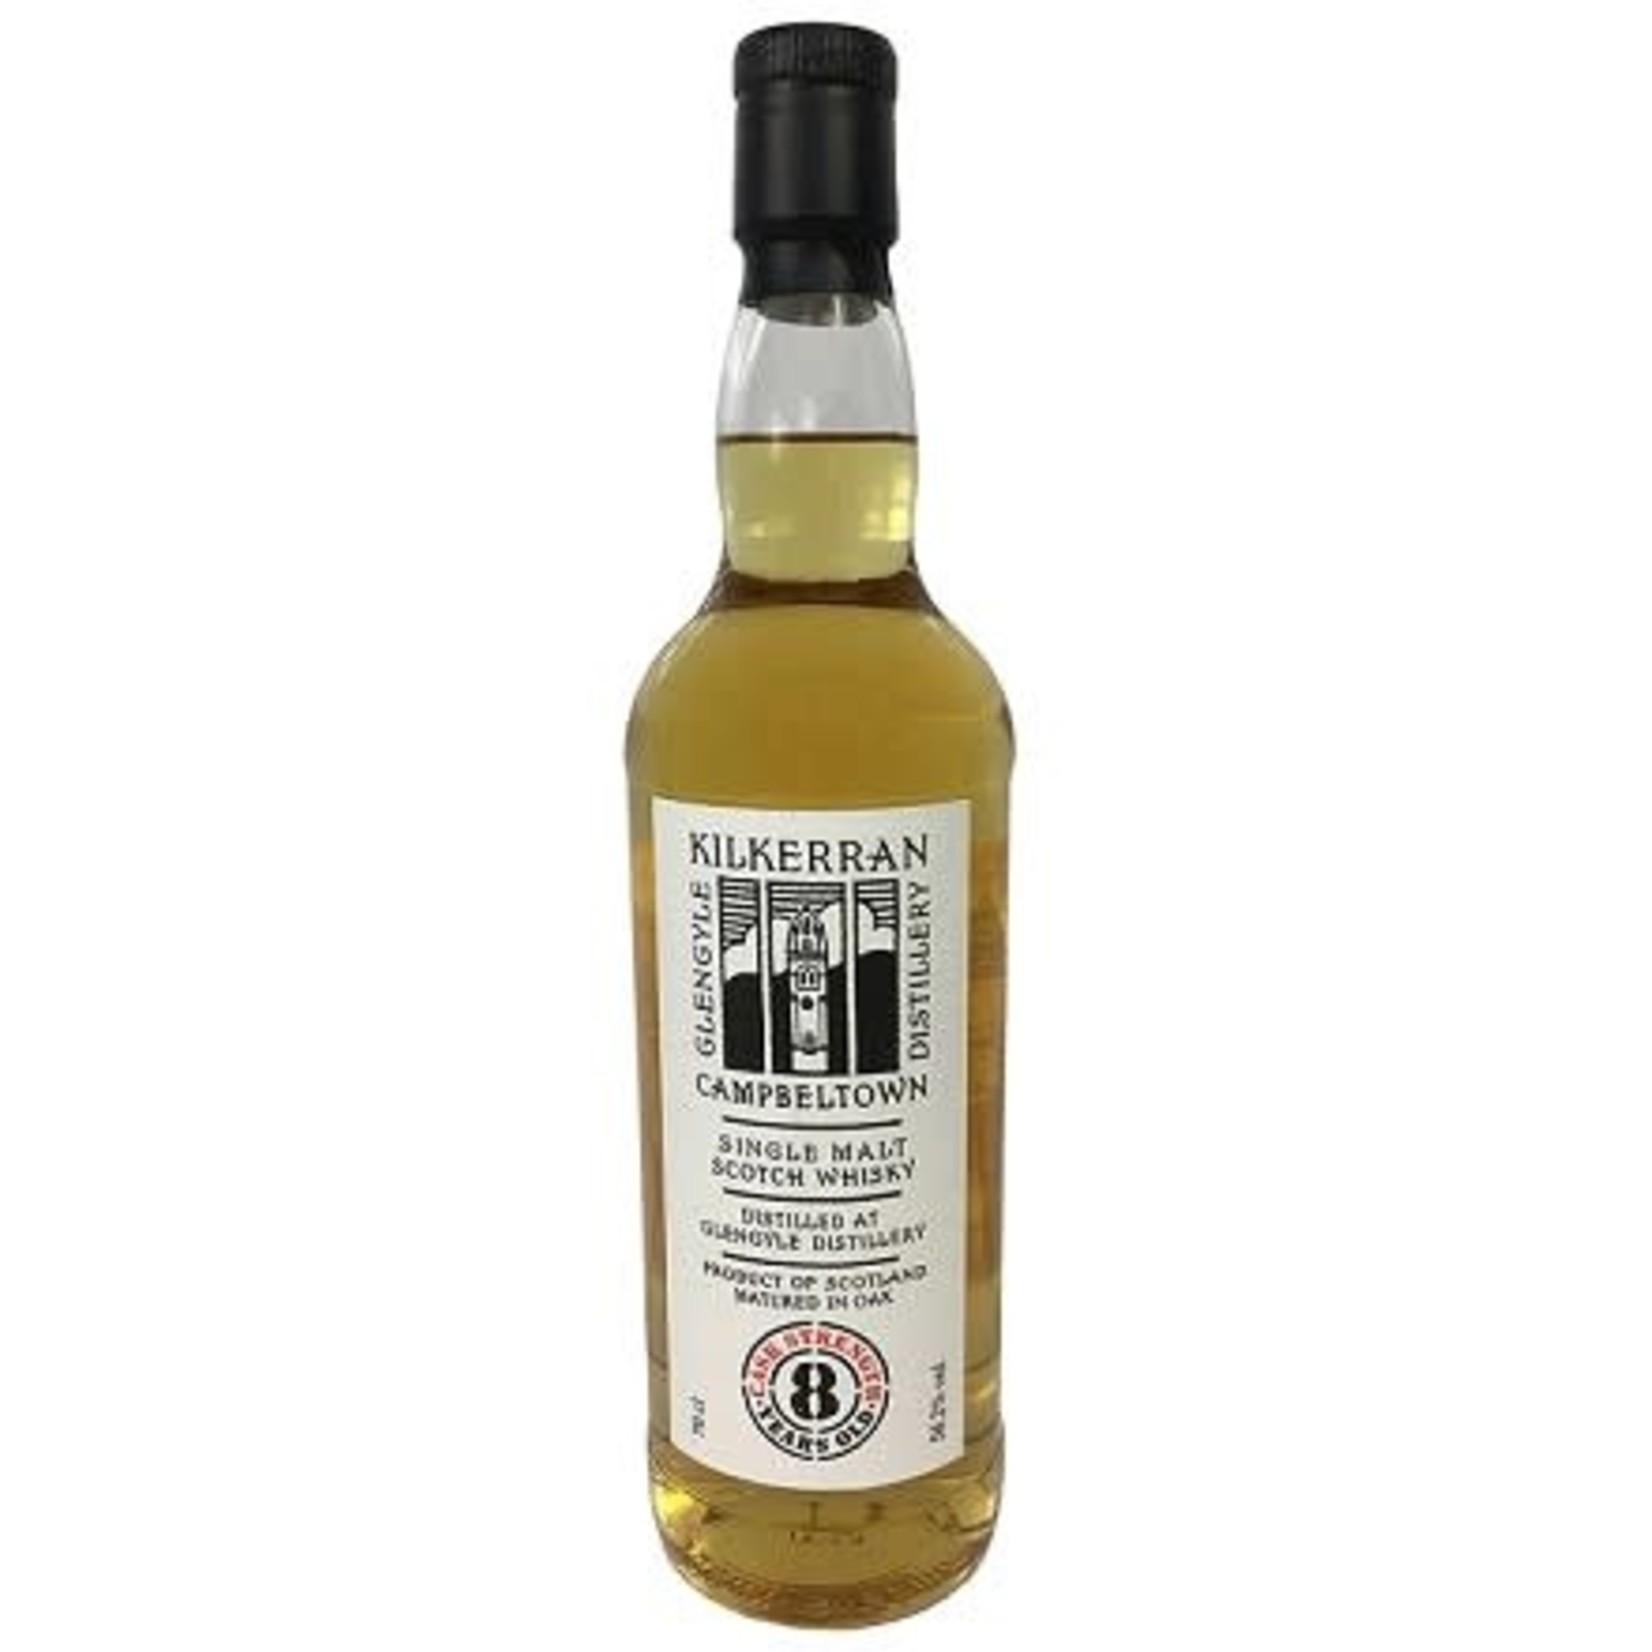 Spirits Glengyle Distilery Kilkerran 8 Year Old Cask Strength Single Malt Scotch Whisky